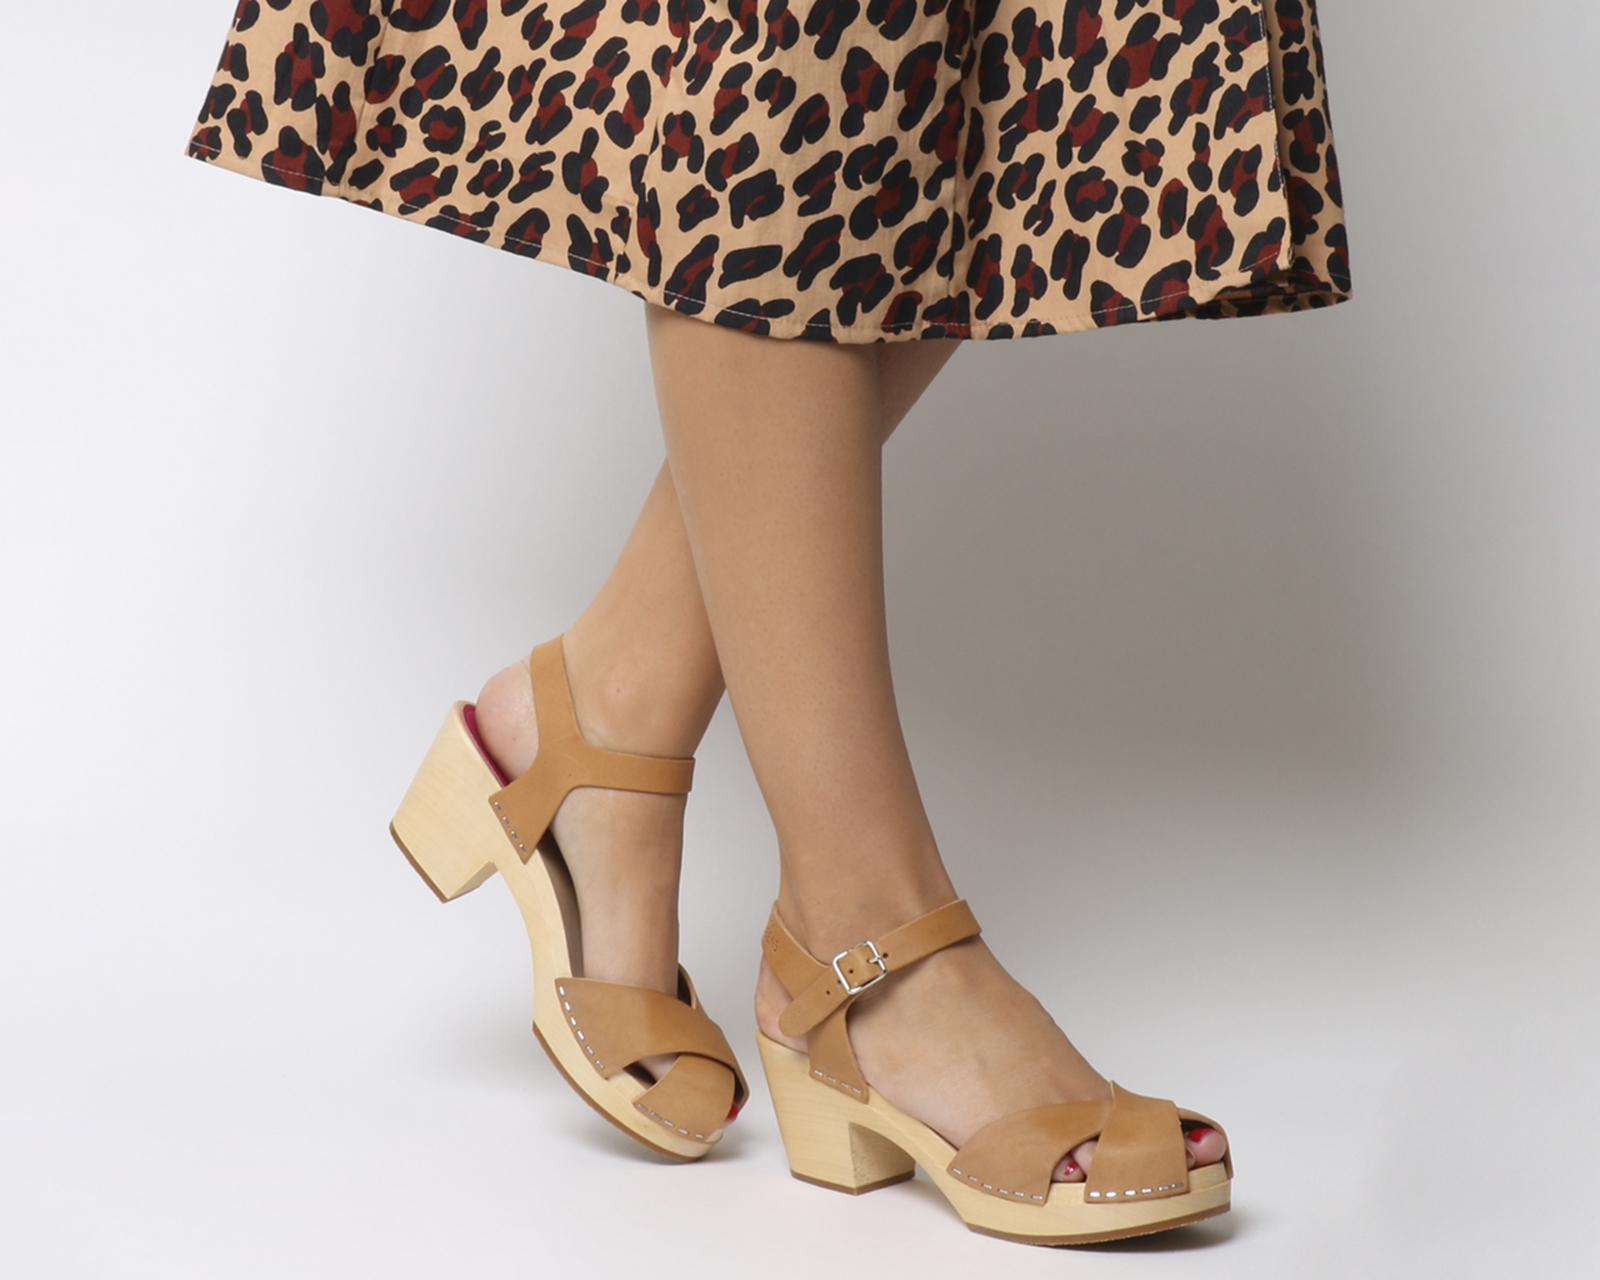 af89375488b Sentinel Womens Swedish Hasbeens Mirja Mid Heel Sandals Nature Heels